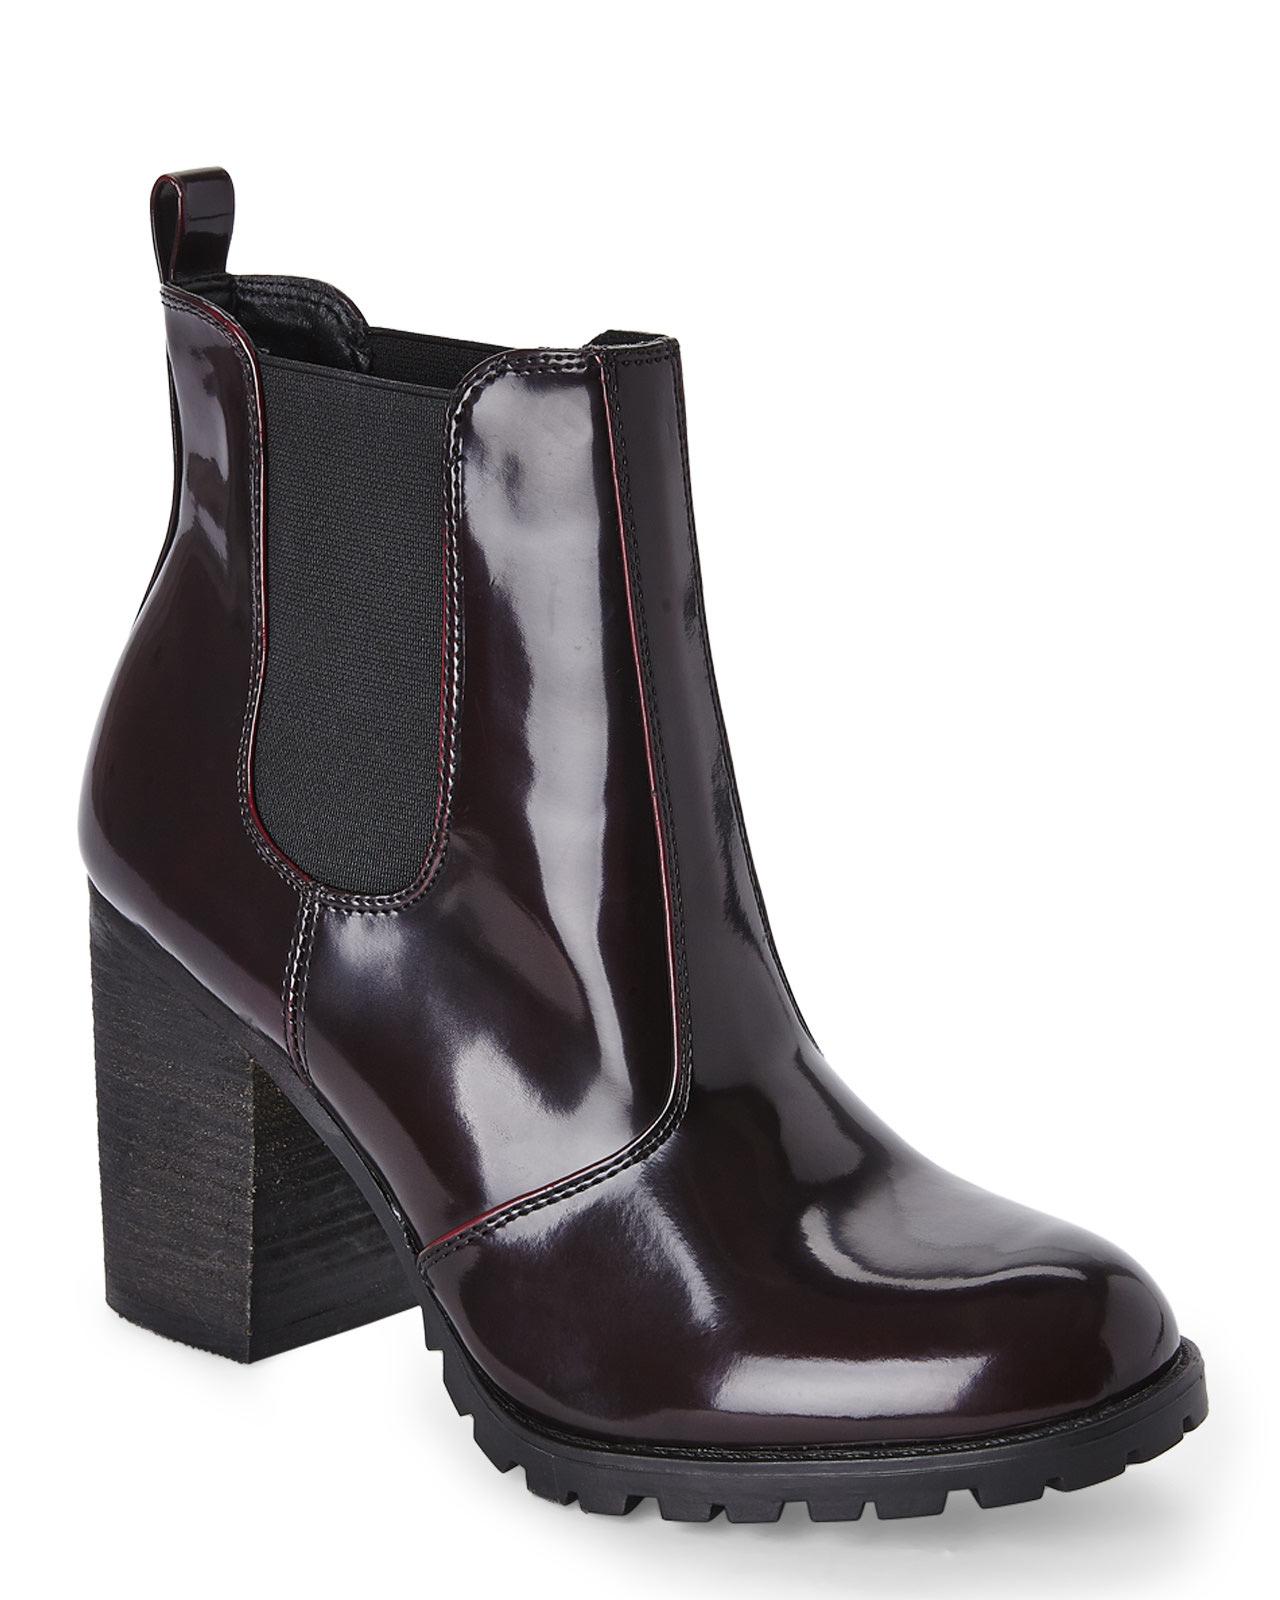 Madden Girl Womens Burgundy Boots Anarchhy